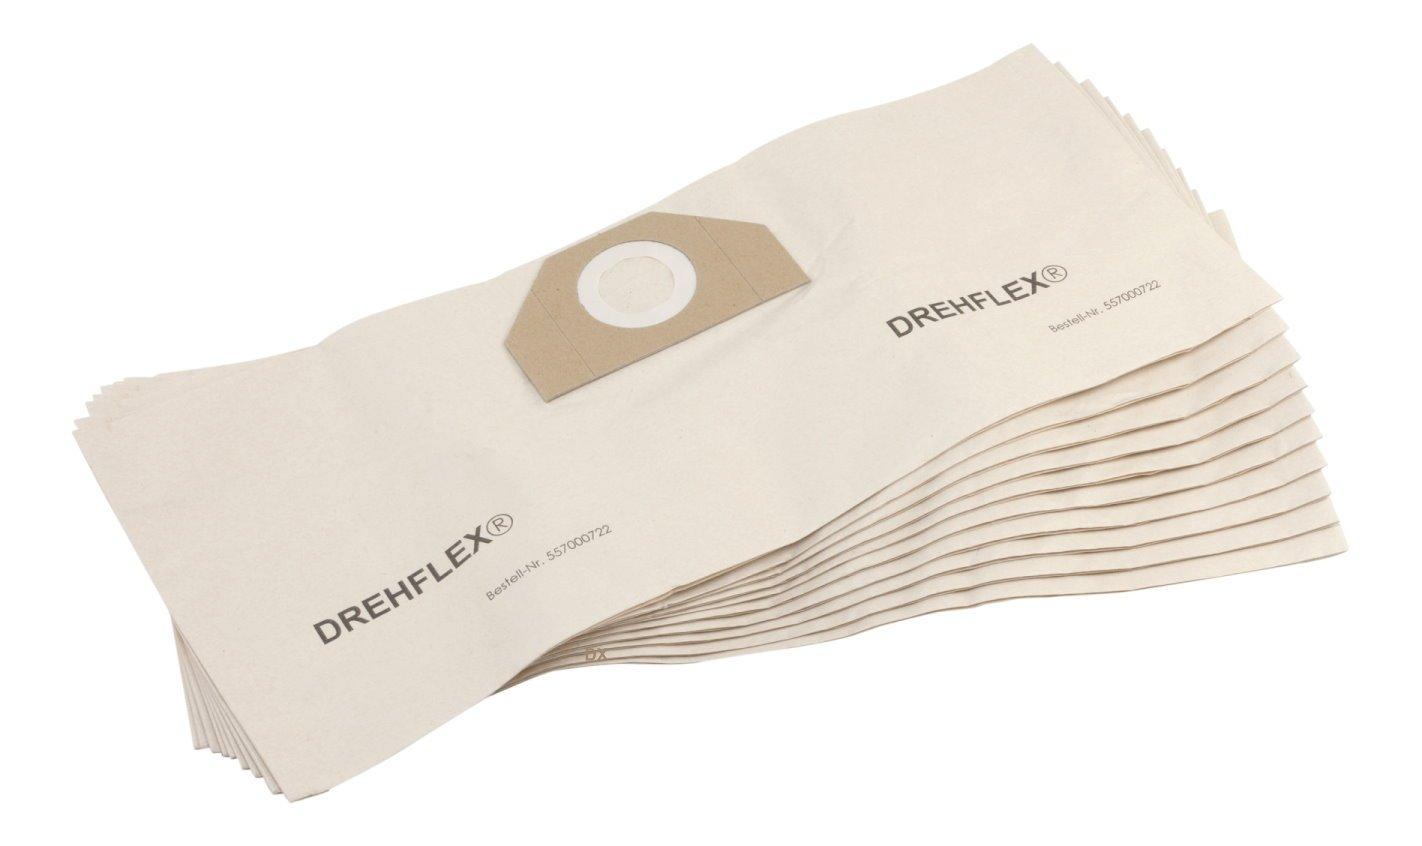 DREHFLEX – 10 x Bolsas de aspiradora sb722 – Material Papel – Apta para varios aspiradora/ – Aspiradora/ – Aspiradora (/multiusos de Kärcher – Aptos ...